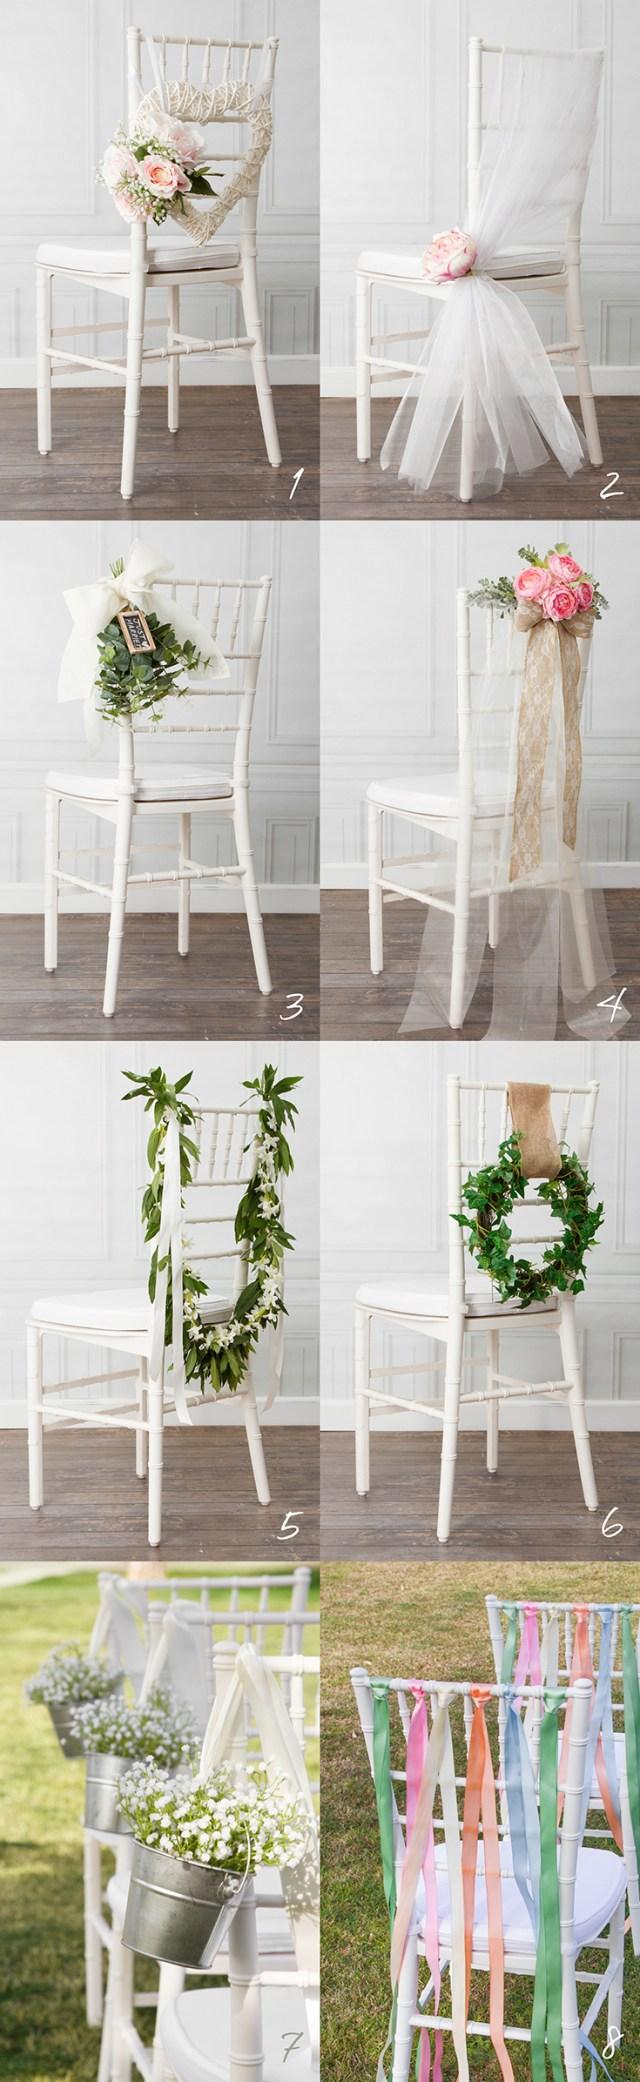 Decor Wedding Diy 8 Beautiful Diy Wedding Chair Decorations